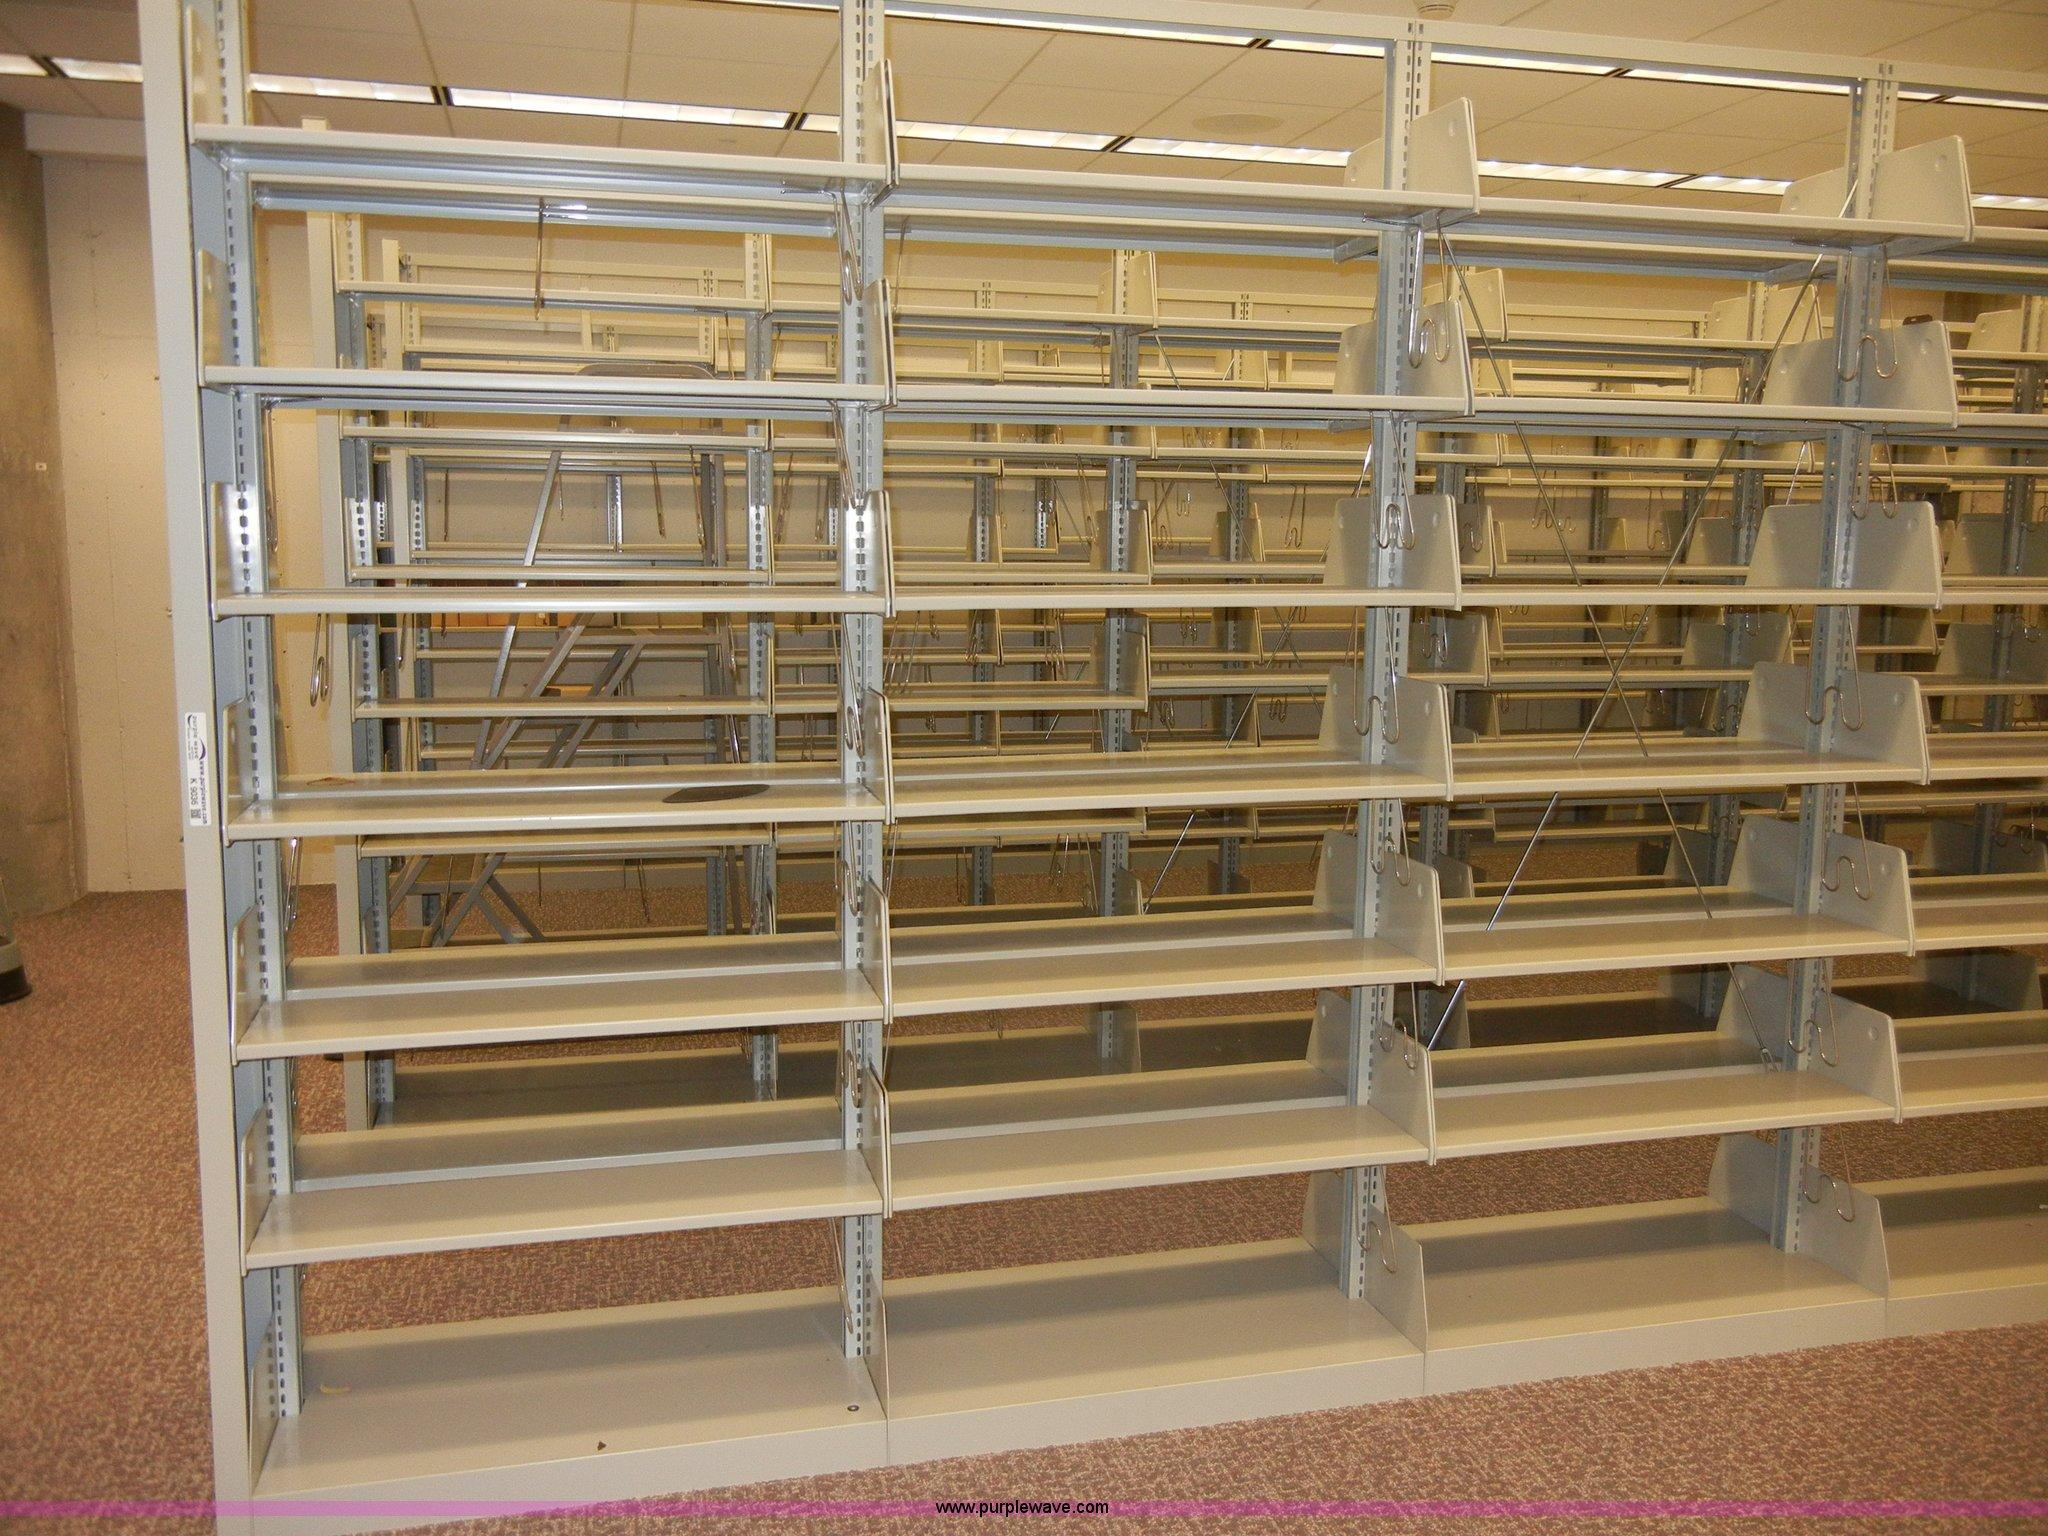 full size in new window - Metal Library Bookshelves